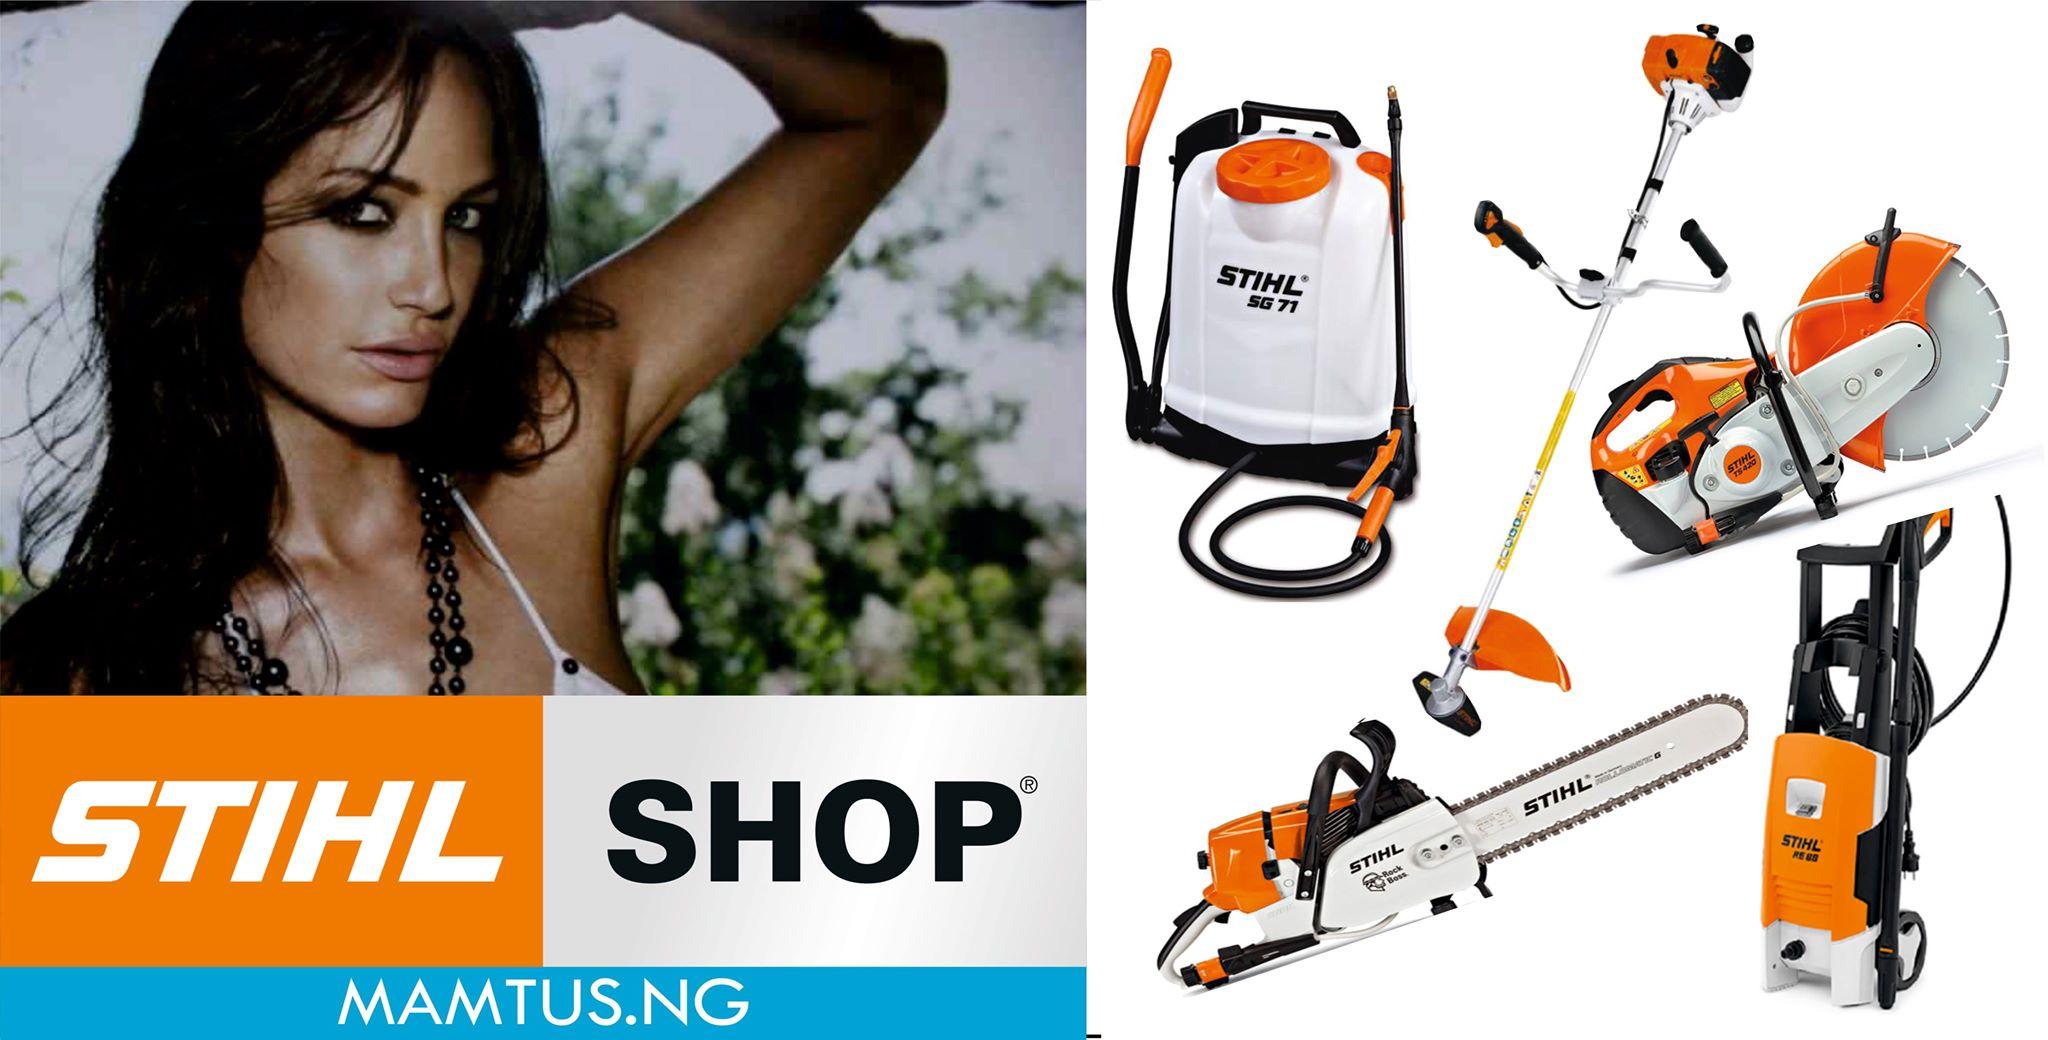 Stihl-2018-Banner---Mamtus-Nigeria.jpg